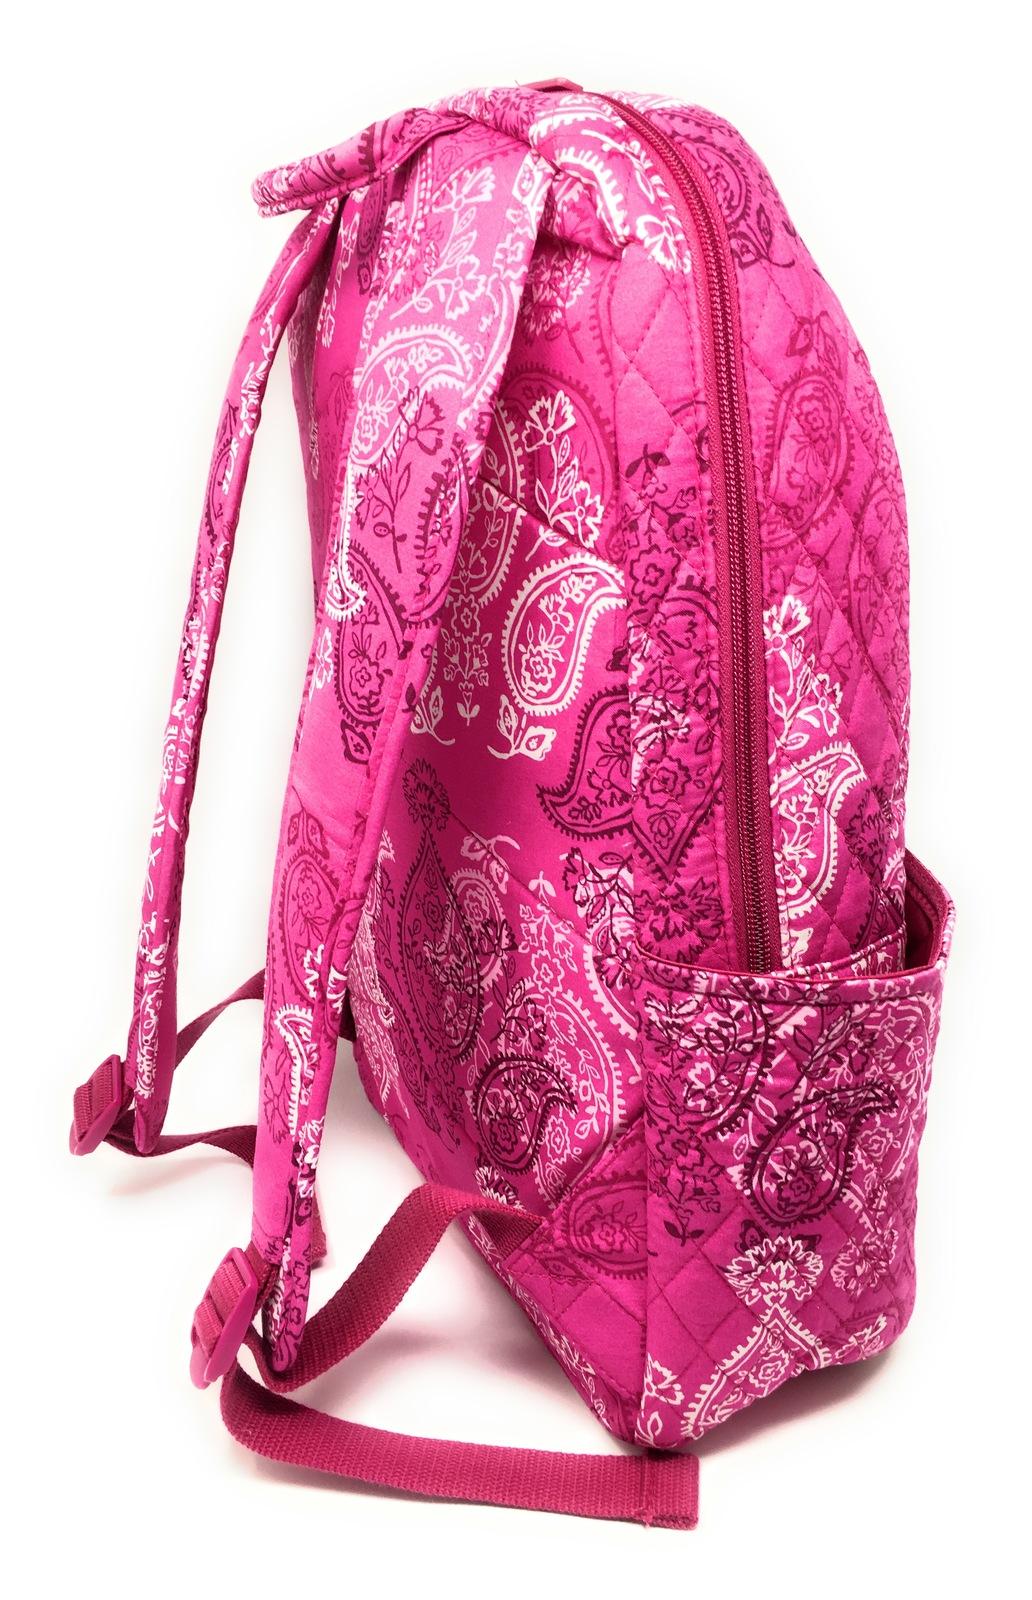 Vera Bradley Laptop Backpack - Stamped Paisley - NWT - $108 MSRP! image 4